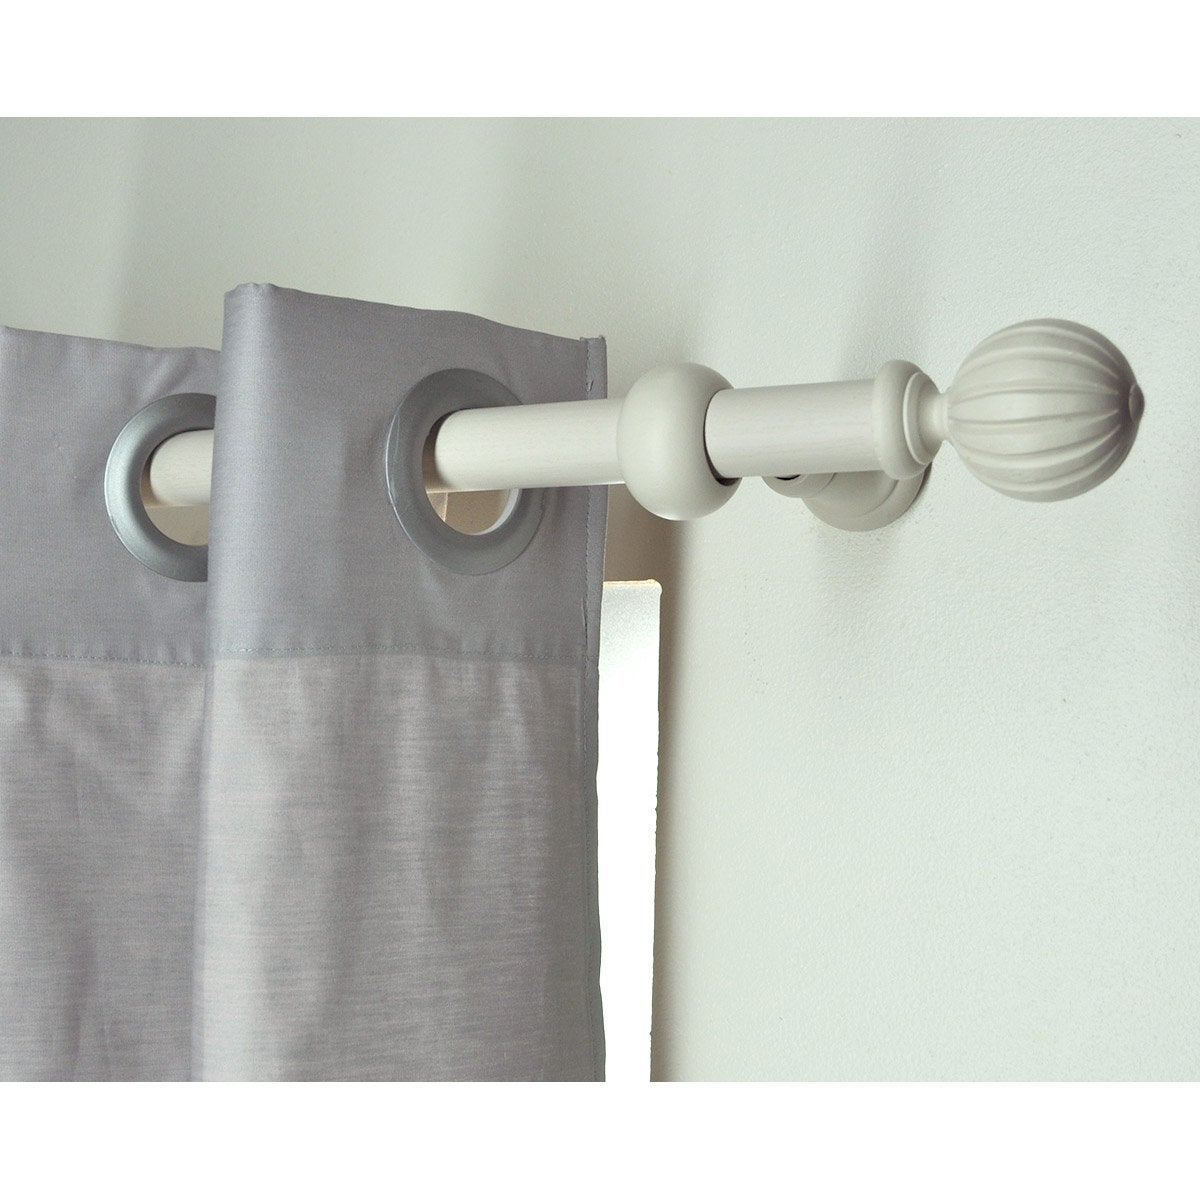 Support Tringle Rideau Plafond support tringle à rideau, 28 mm plume brillant inspire